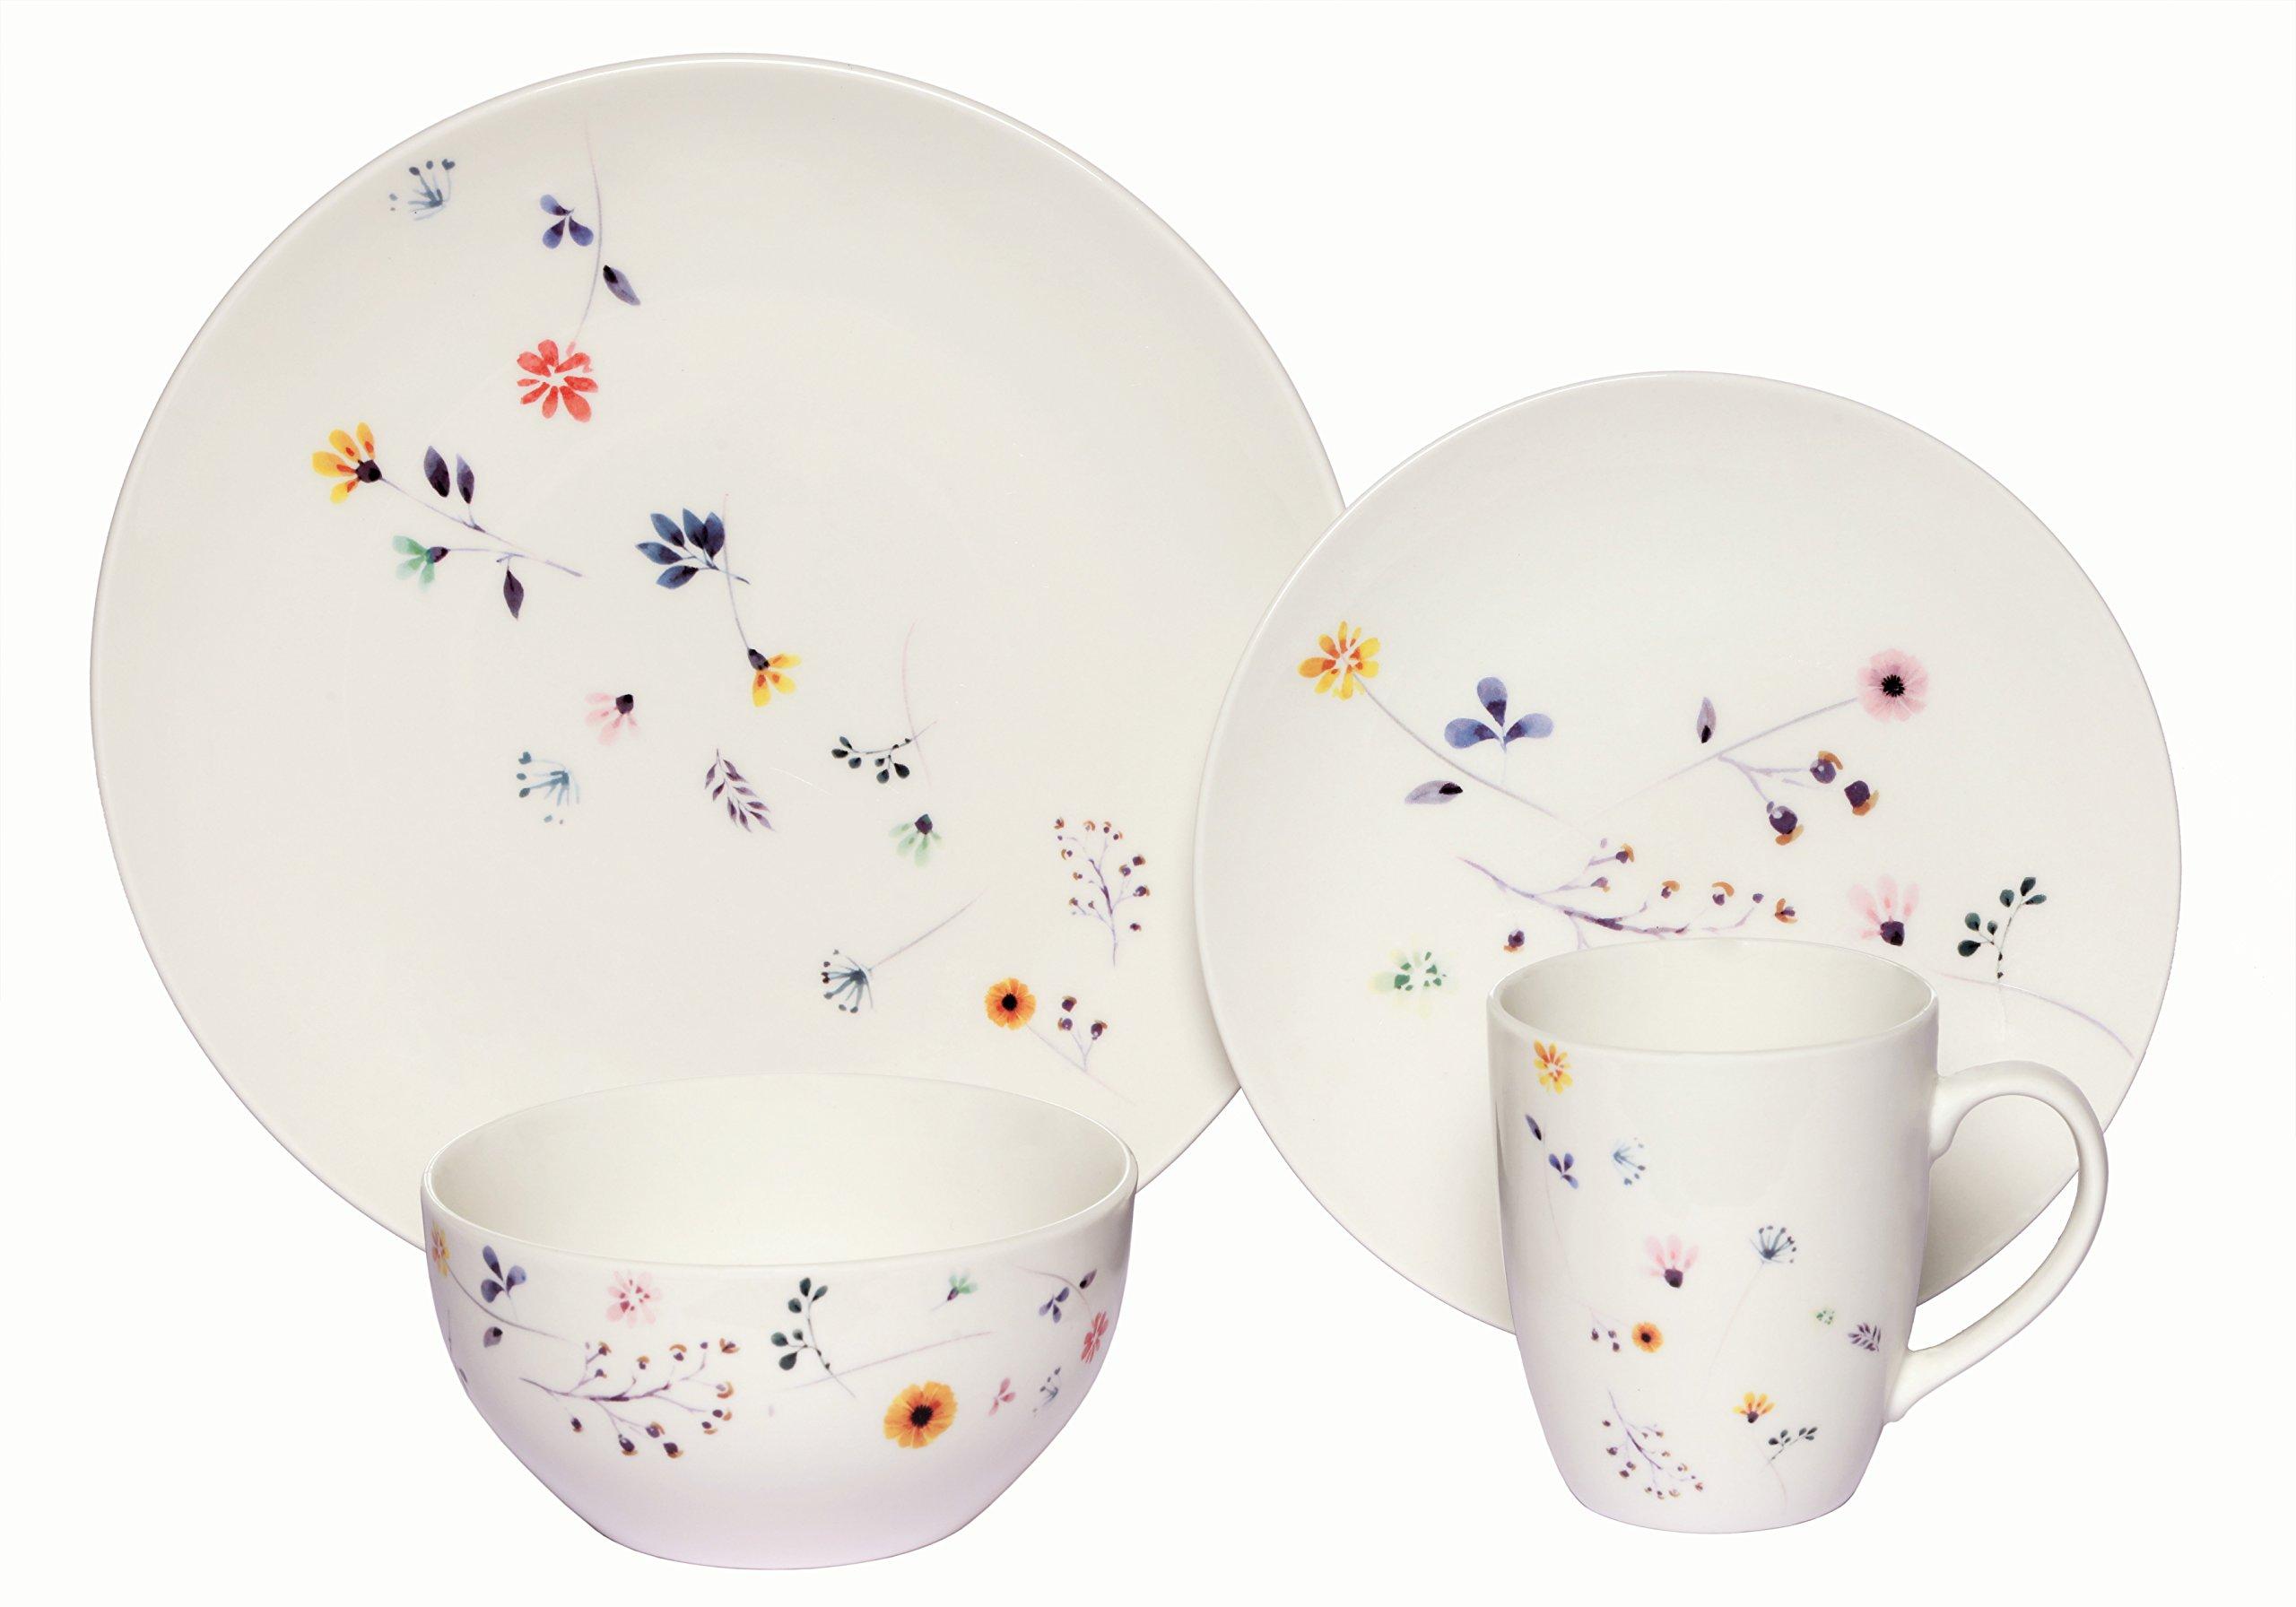 Melange Coupe 32-Piece Porcelain Dinnerware Set (Scattered Wildflowers) | Service for 8 | Microwave, Dishwasher & Oven Safe | Dinner Plate, Salad Plate, Soup Bowl & Mug (8 Each)